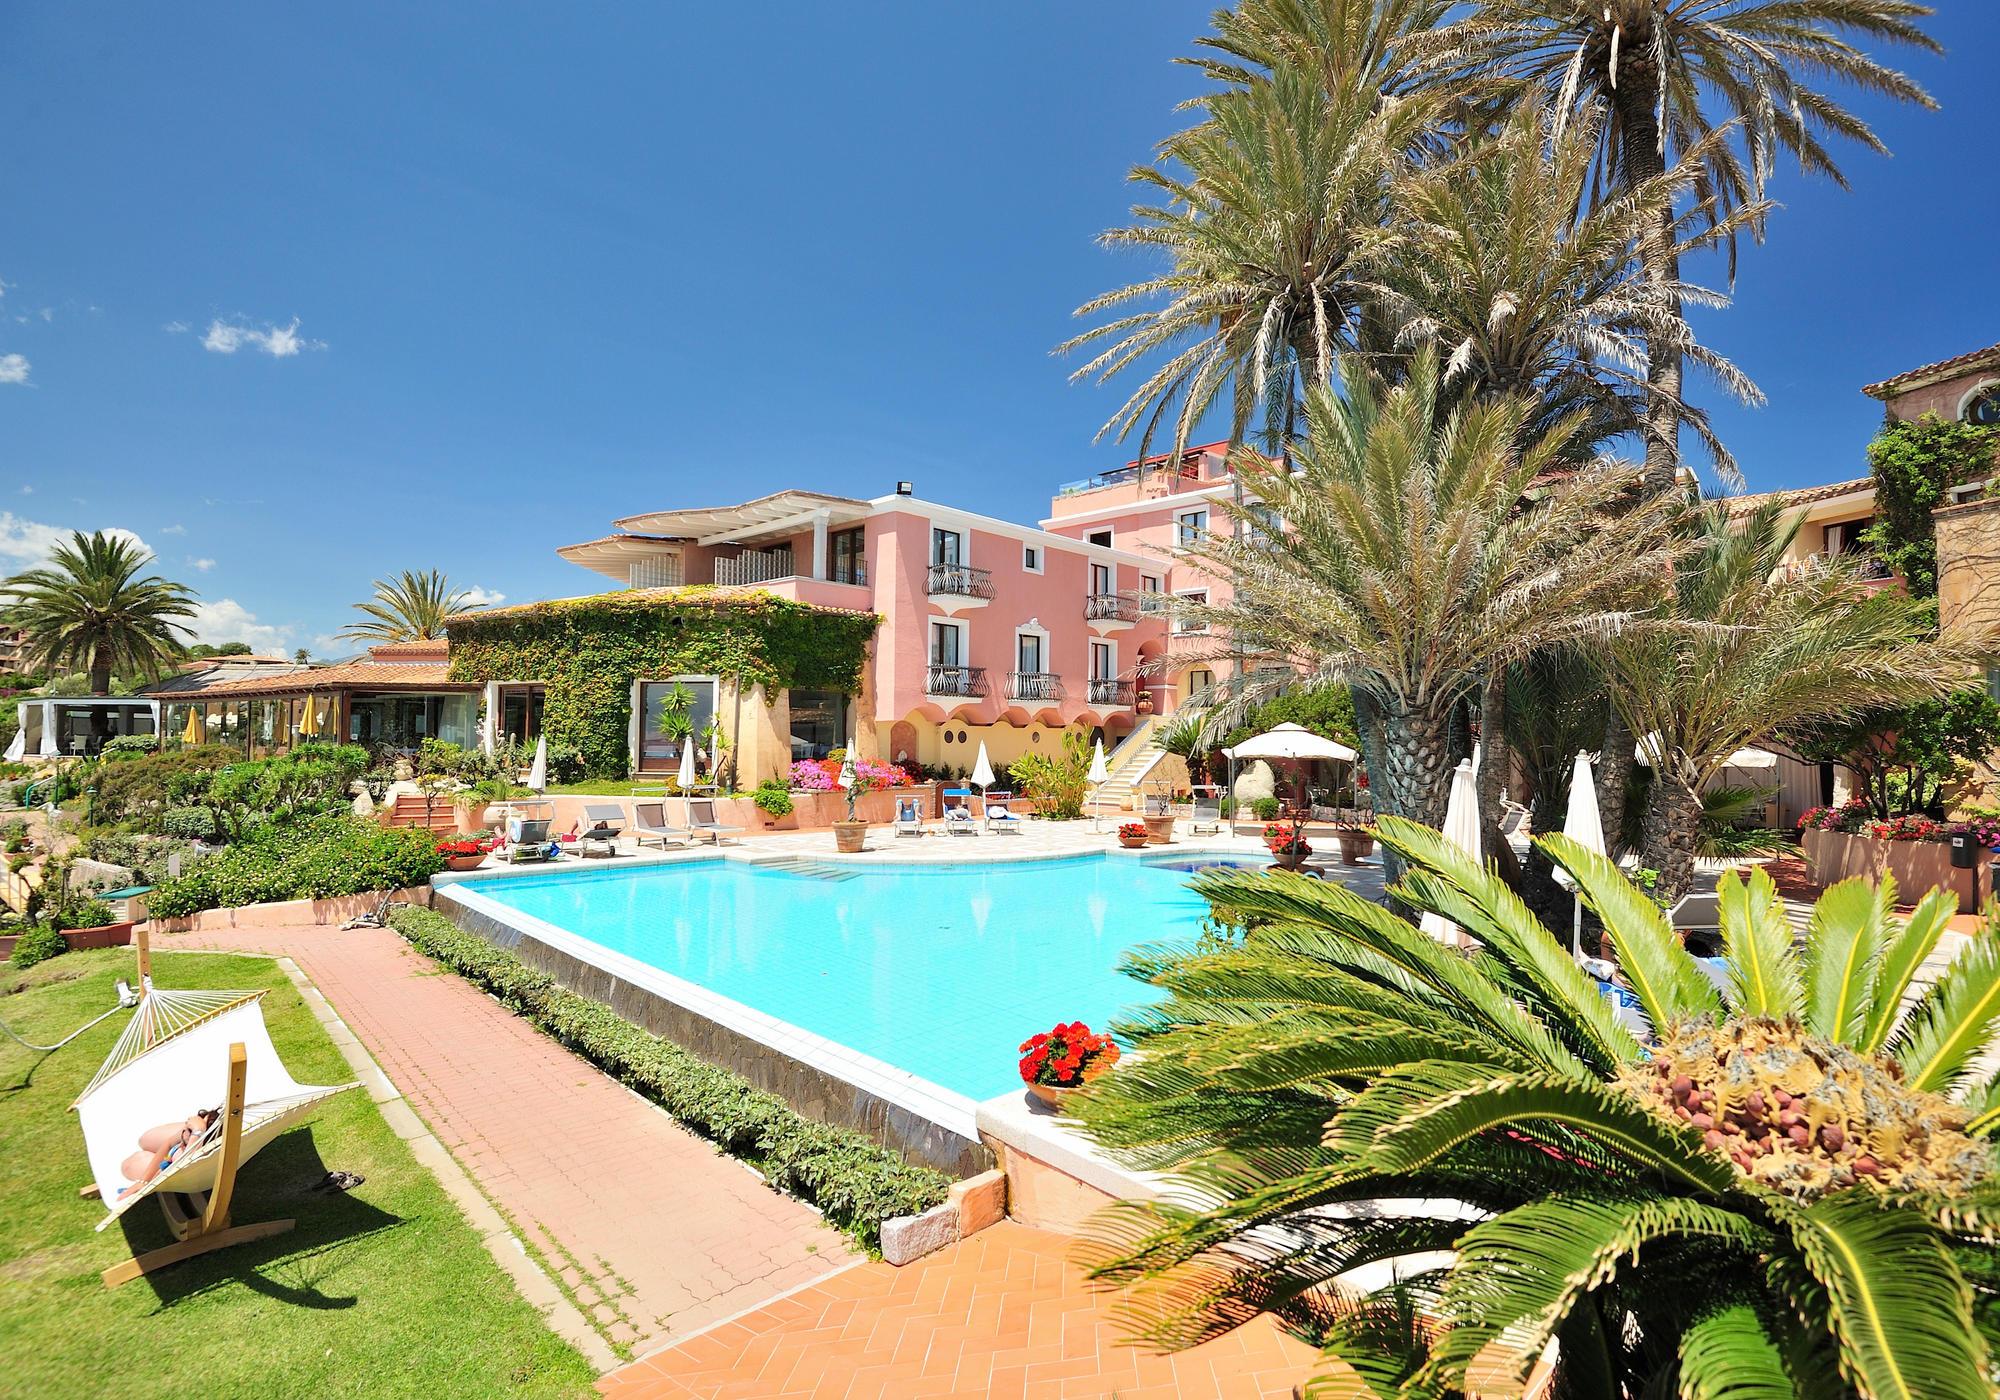 Hotel La Bitta (oosten) 10